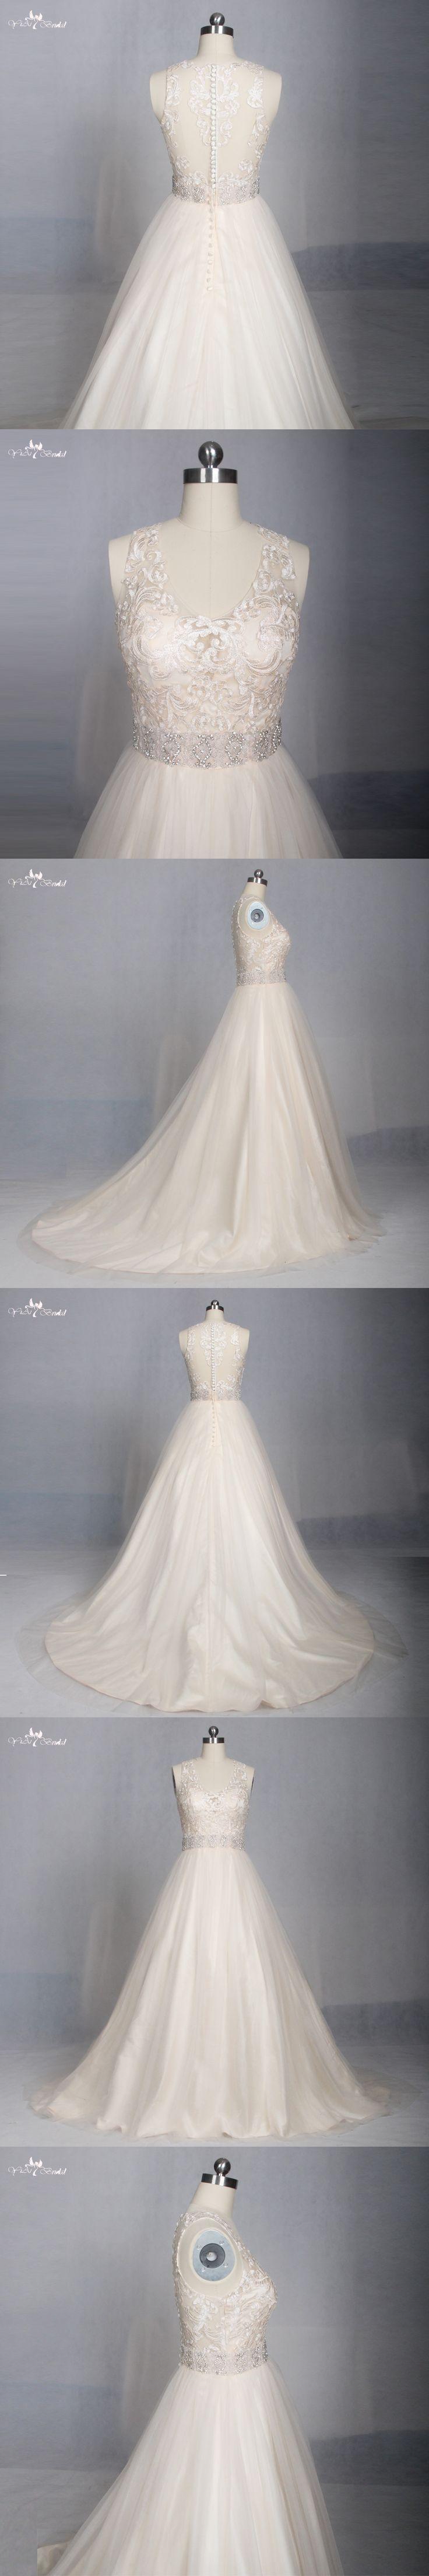 LZ174 Alibaba Champagne Scoop Lace Fabric Vestido De Noiva Chiffon A Line Wedding Dress Crystal Wedding Dresses